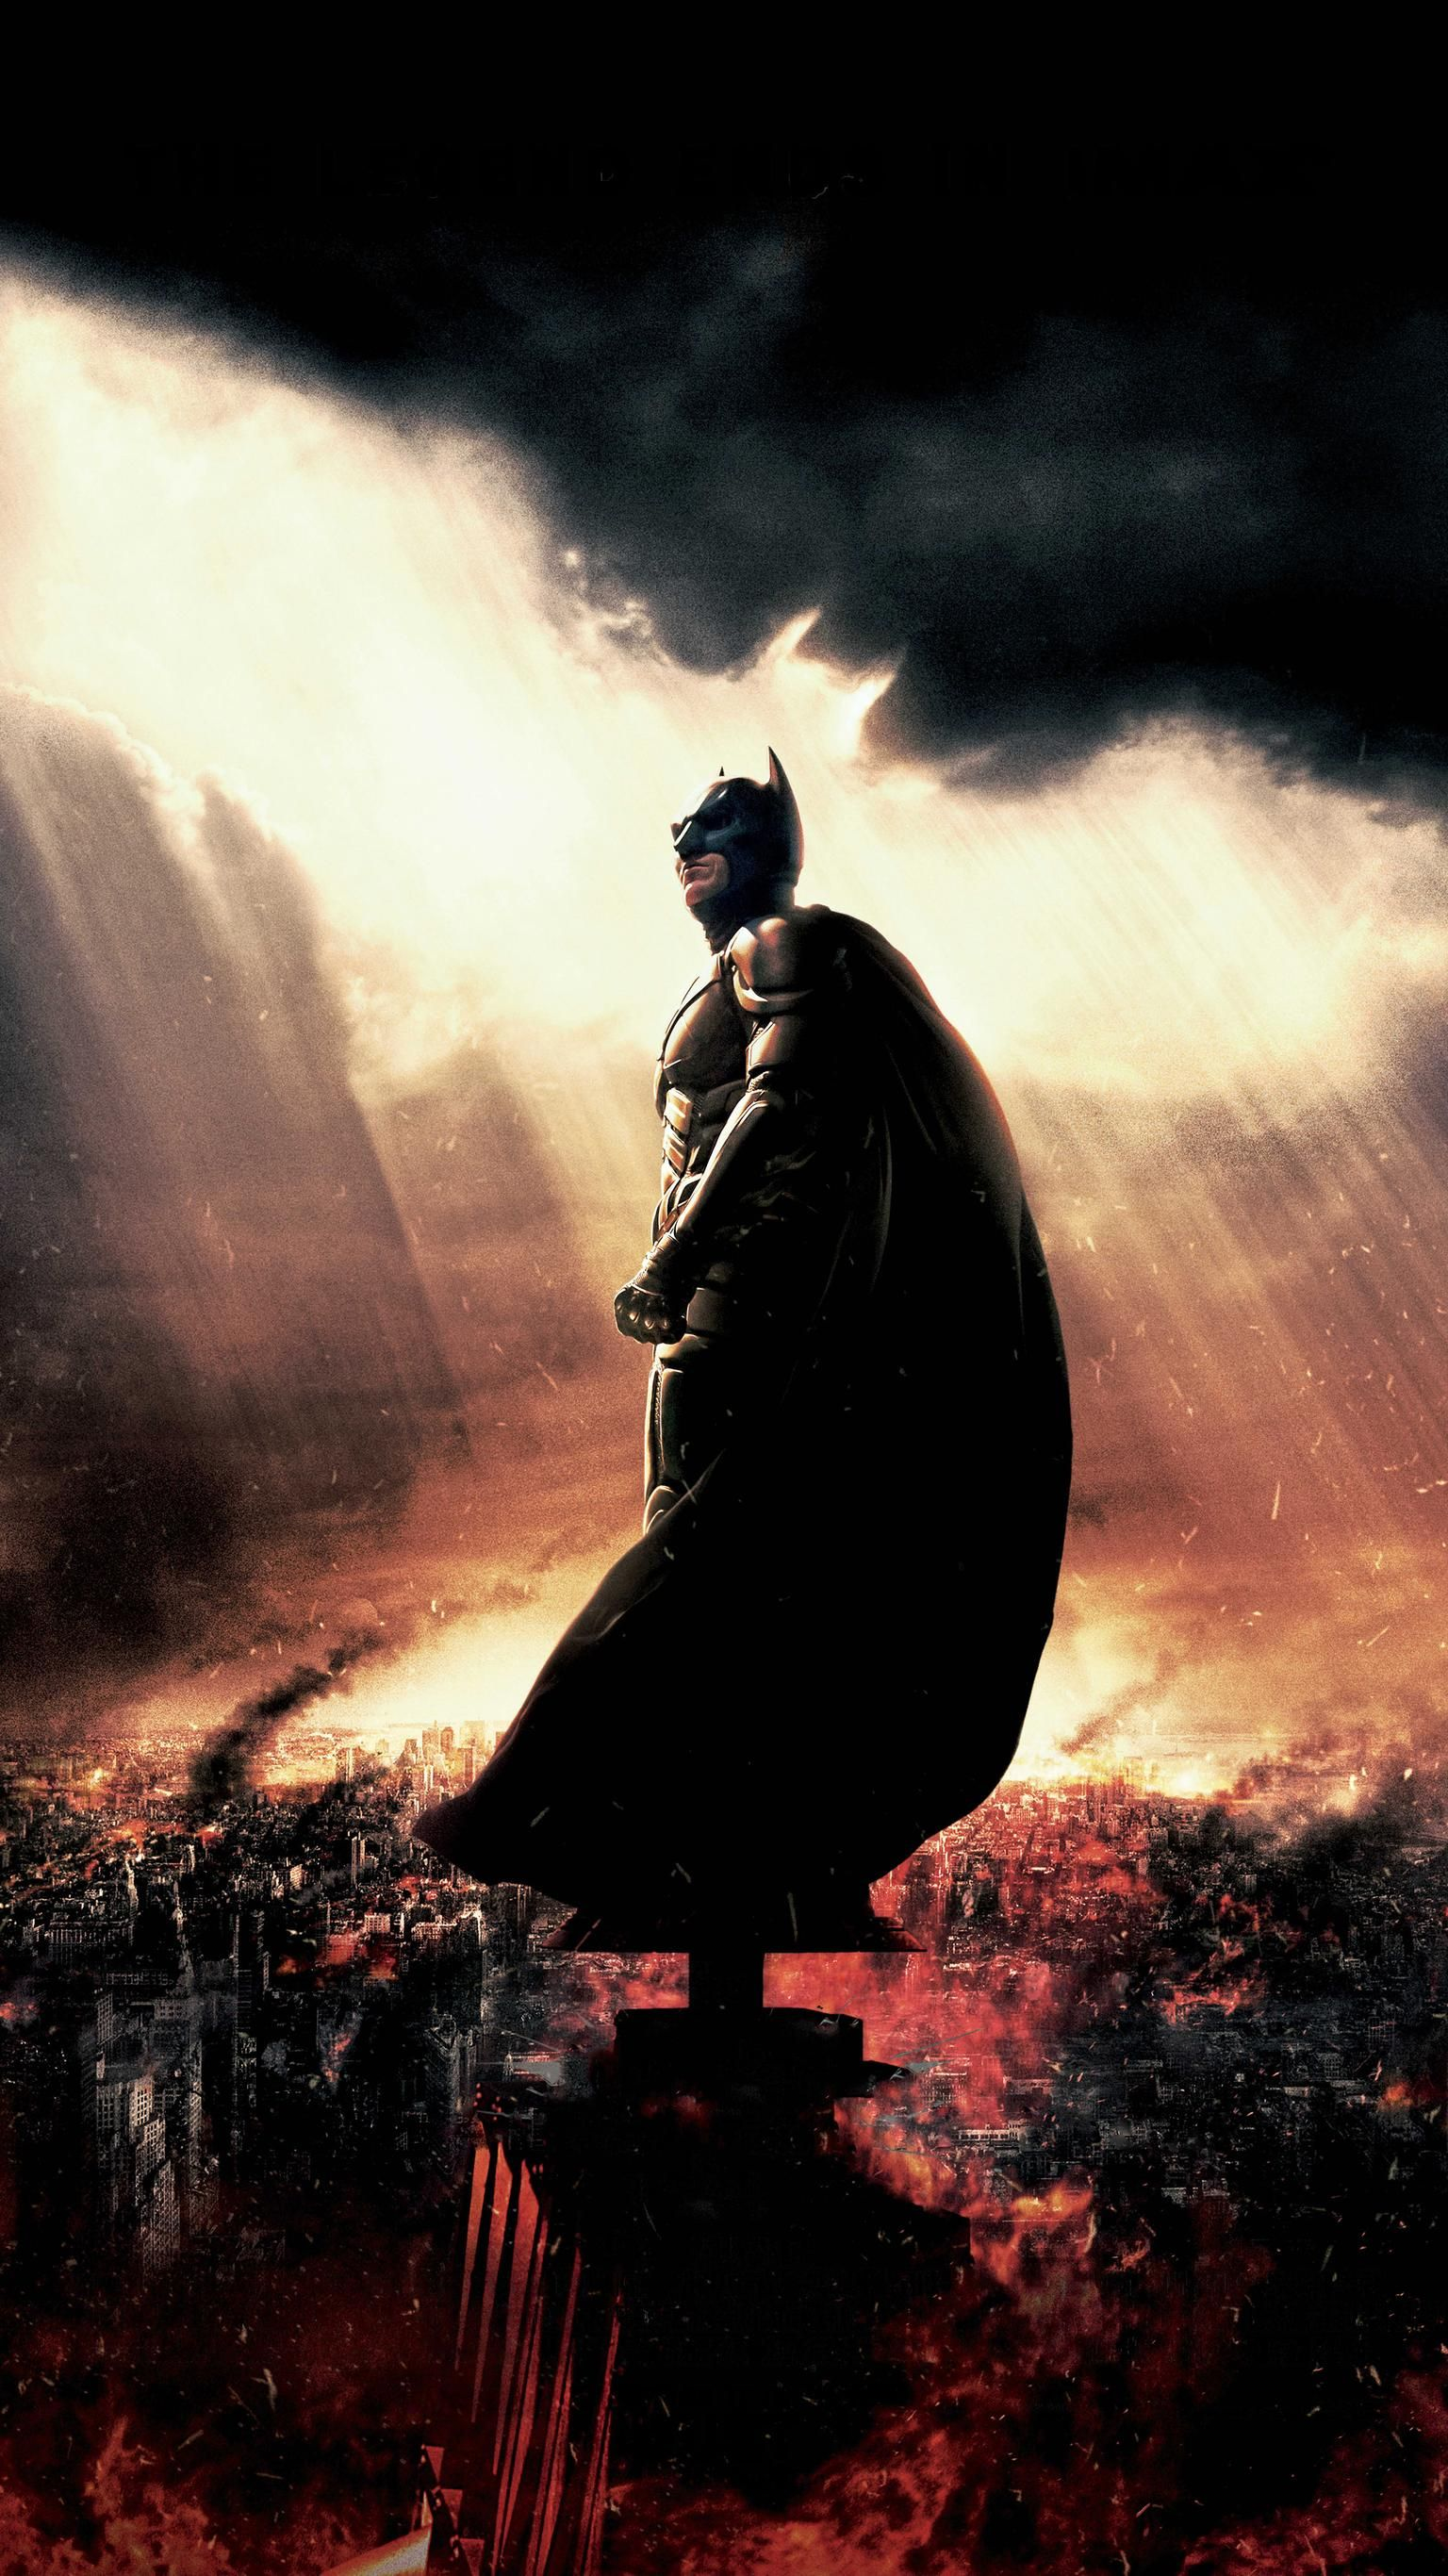 The Dark Knight Rises 2012 Phone Wallpaper Moviemania Dark Knight Wallpaper The Dark Knight Rises Batman